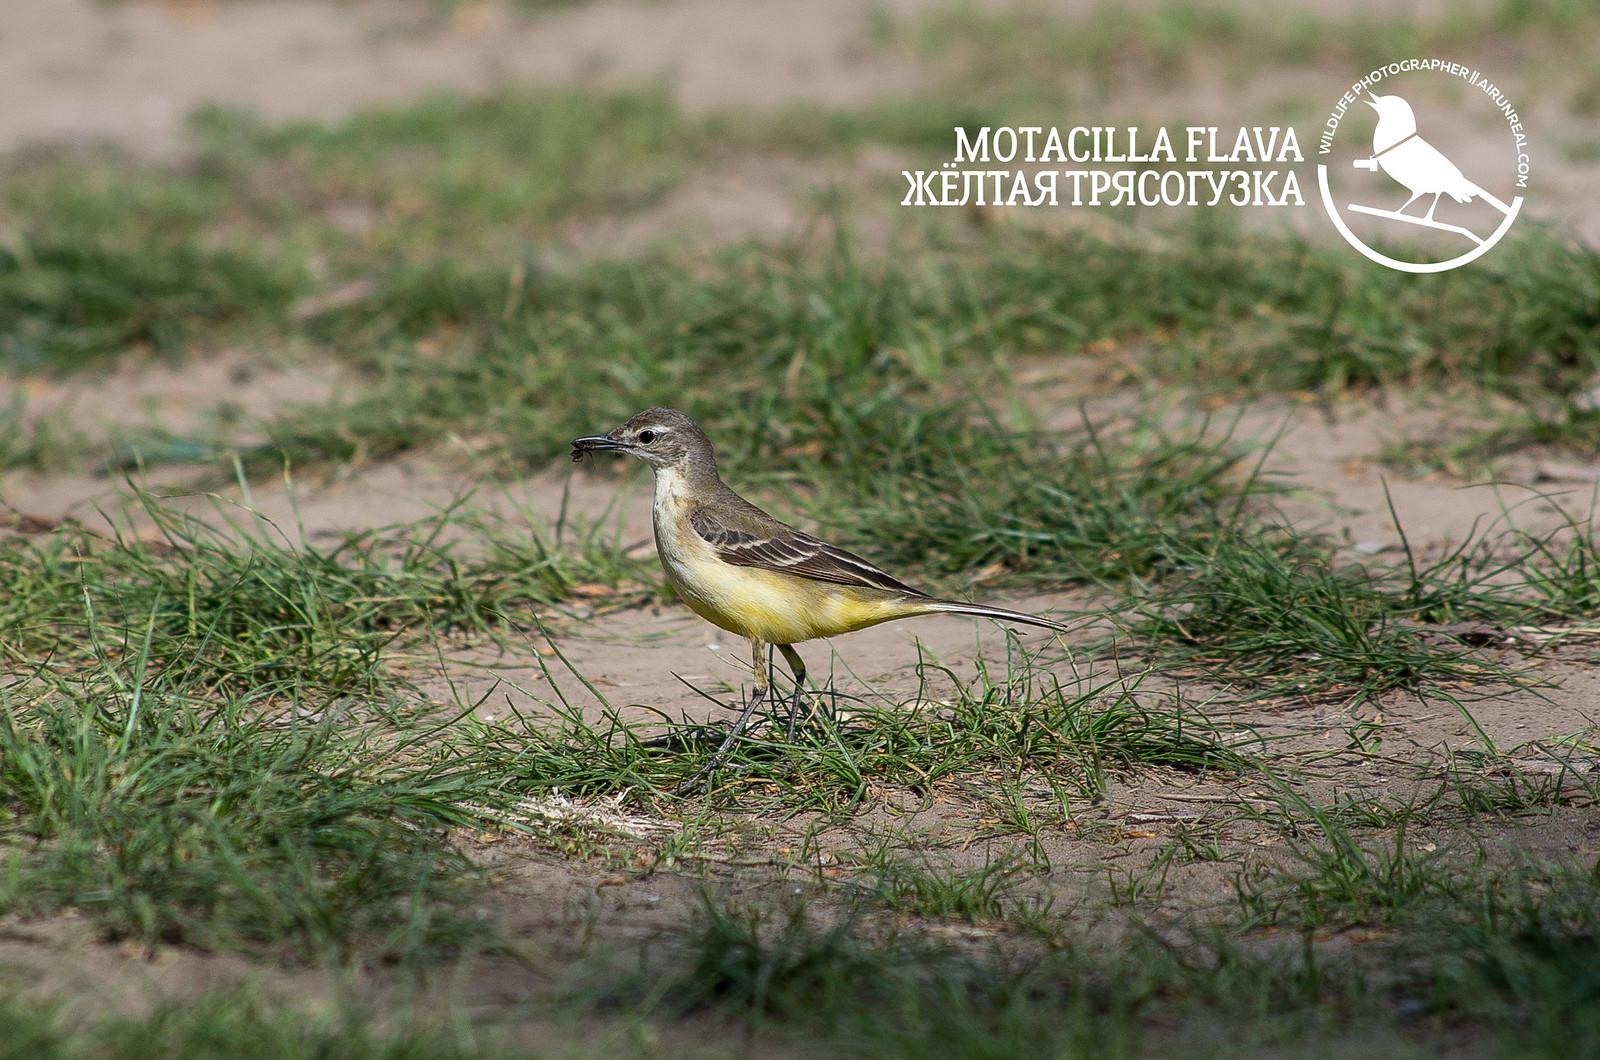 Motacilla flava // 20170613